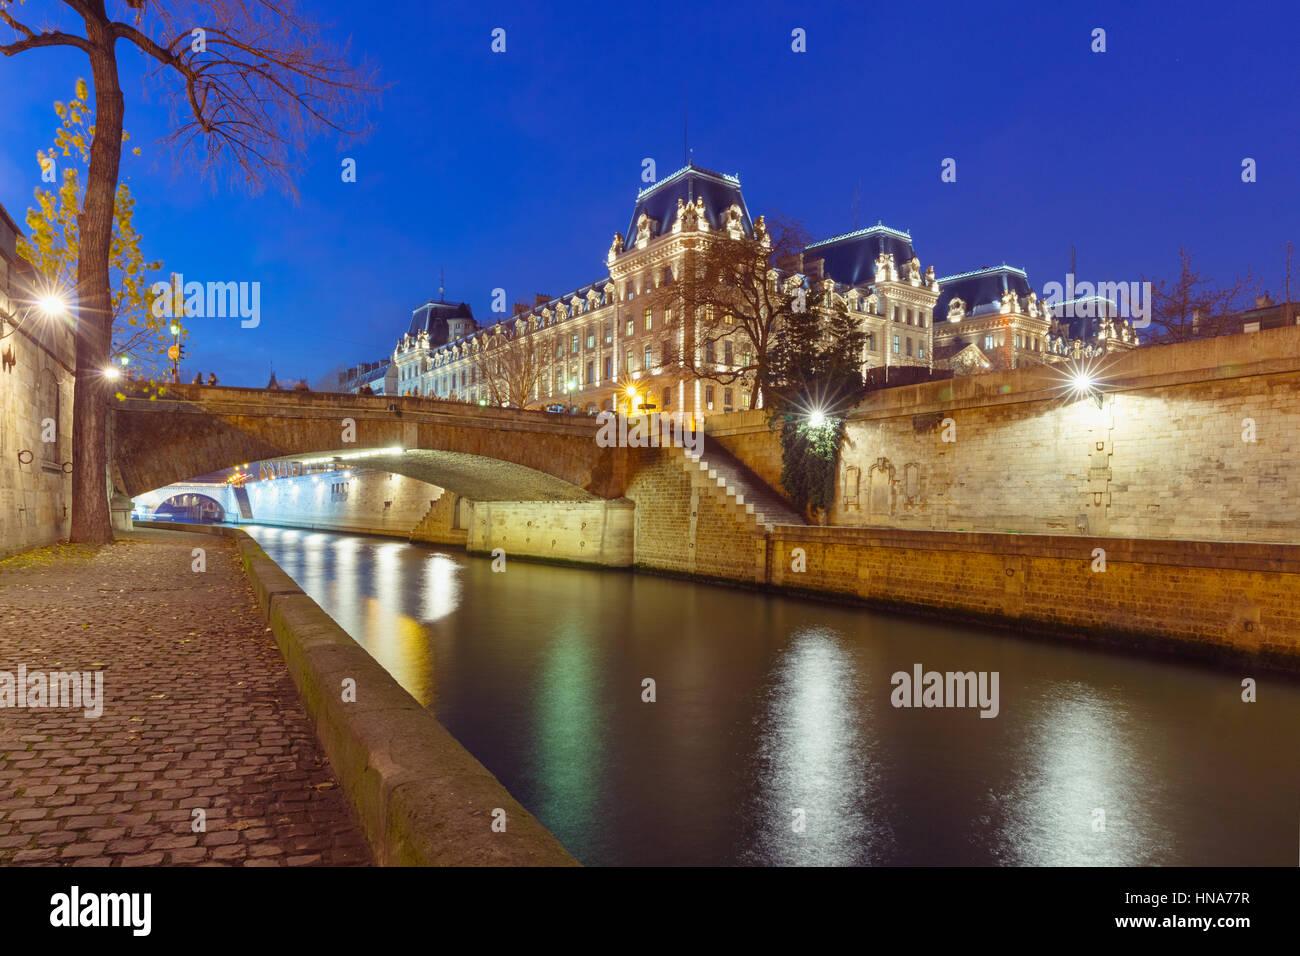 Paris at night, France - Stock Image